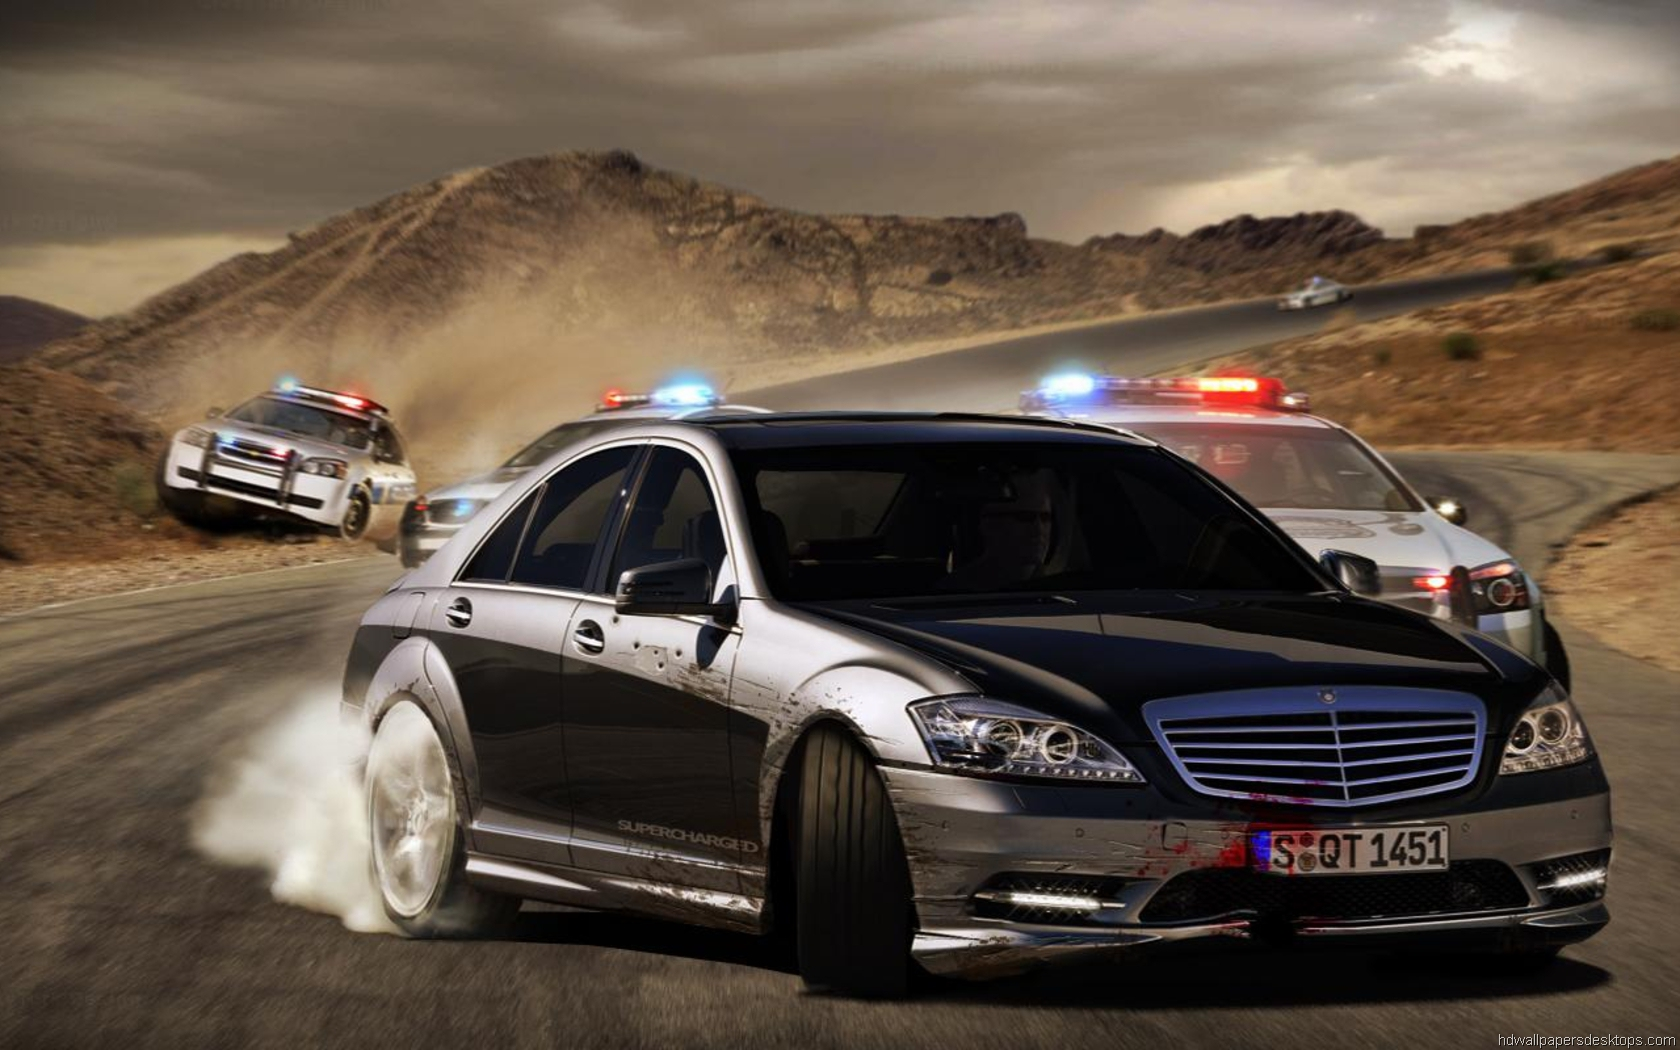 cars wallpapers hd full hd 1080p desktop backgrounds 1680x1050 Car 1680x1050